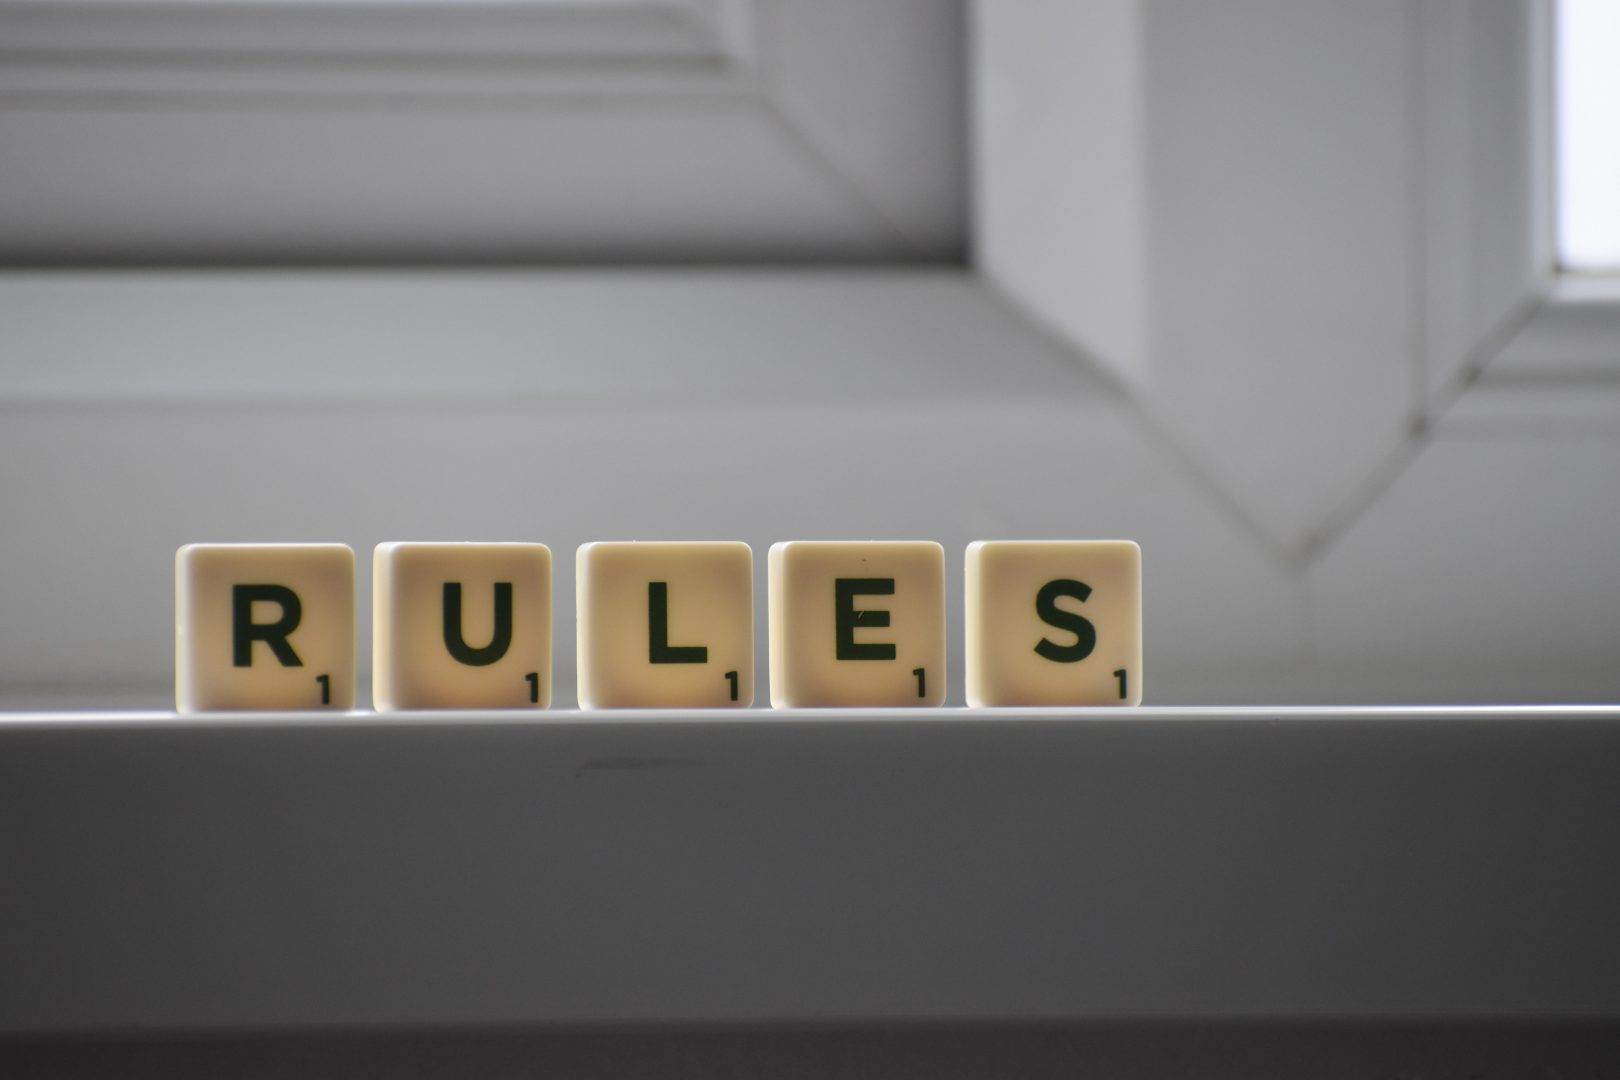 scrabble-letters-spelling-rules